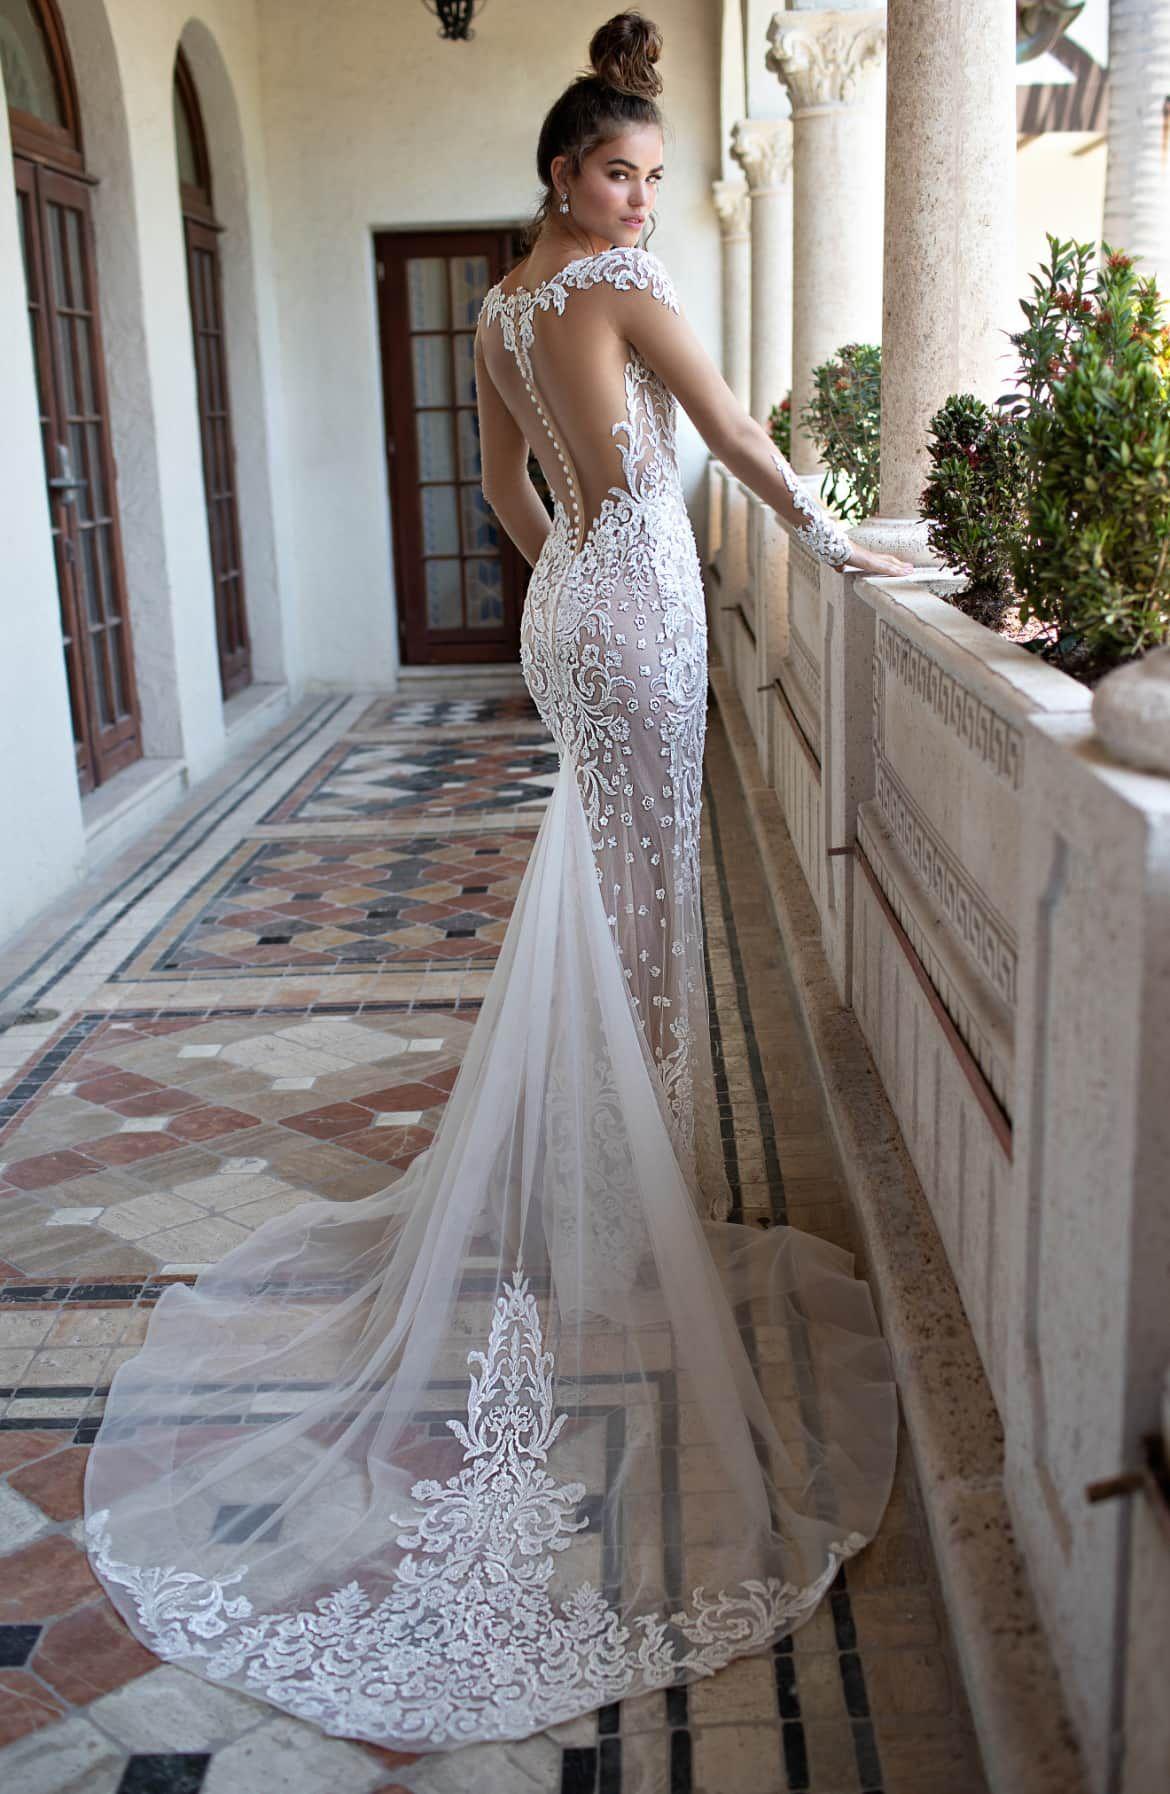 Berta Illusion Long Sleeve Embroidered Trumpet Wedding Dress Nordstrom Mermaid Wedding Dress With Sleeves Wedding Dress Necklines Sheer Wedding Dress